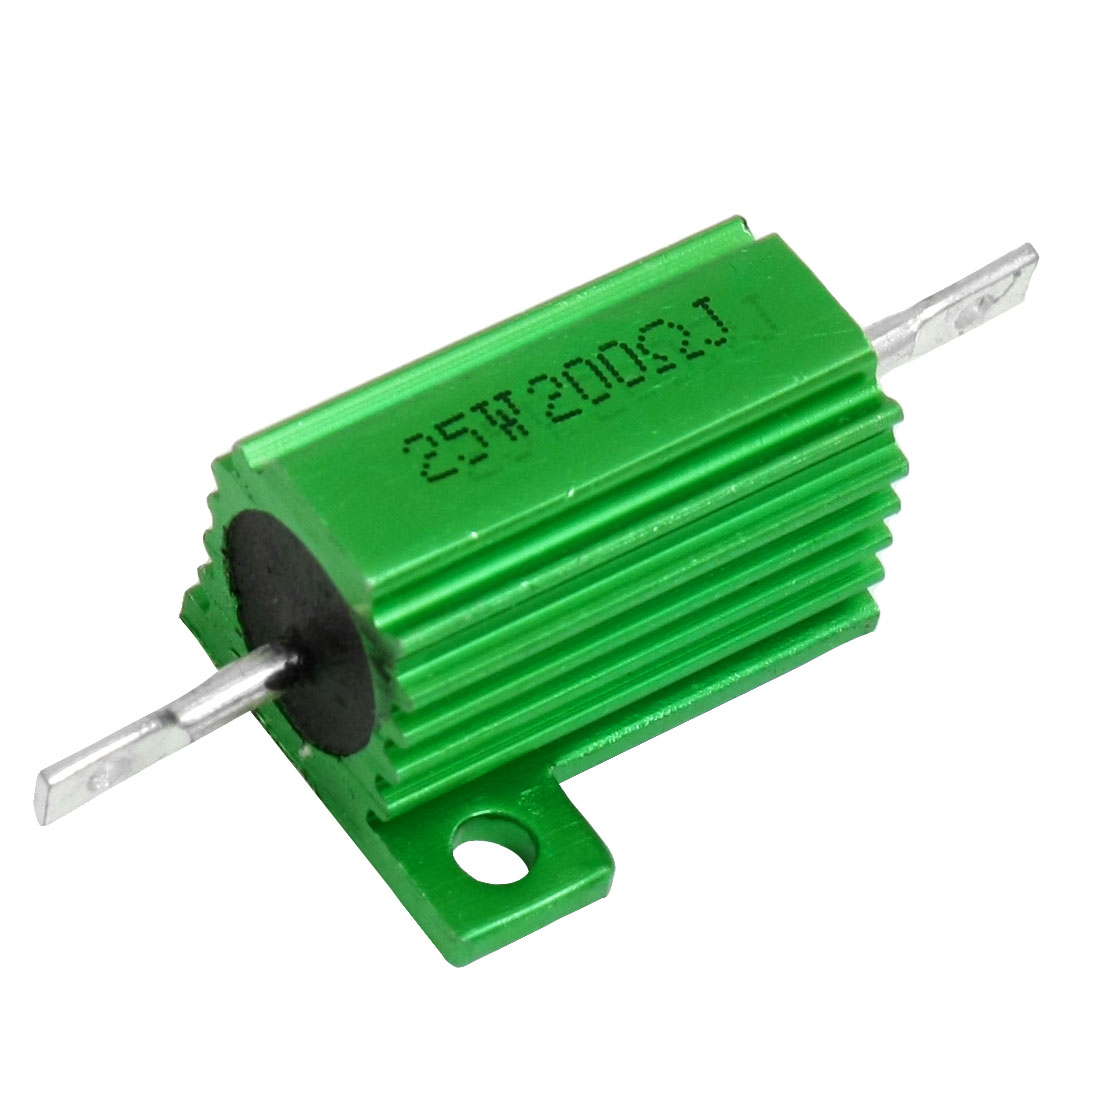 Green Aluminum Housed Clad Wirewound Resistor 5% 200 Ohm 25 Watt